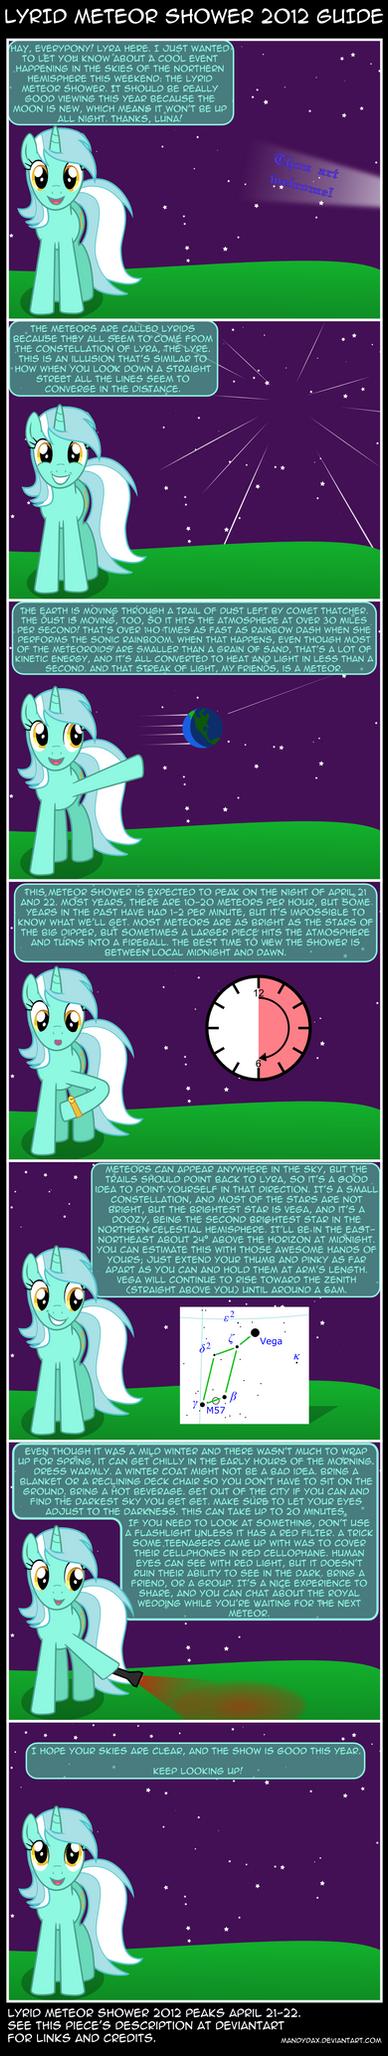 Lyra Explains the Lyrid Meteor Shower by mandydax